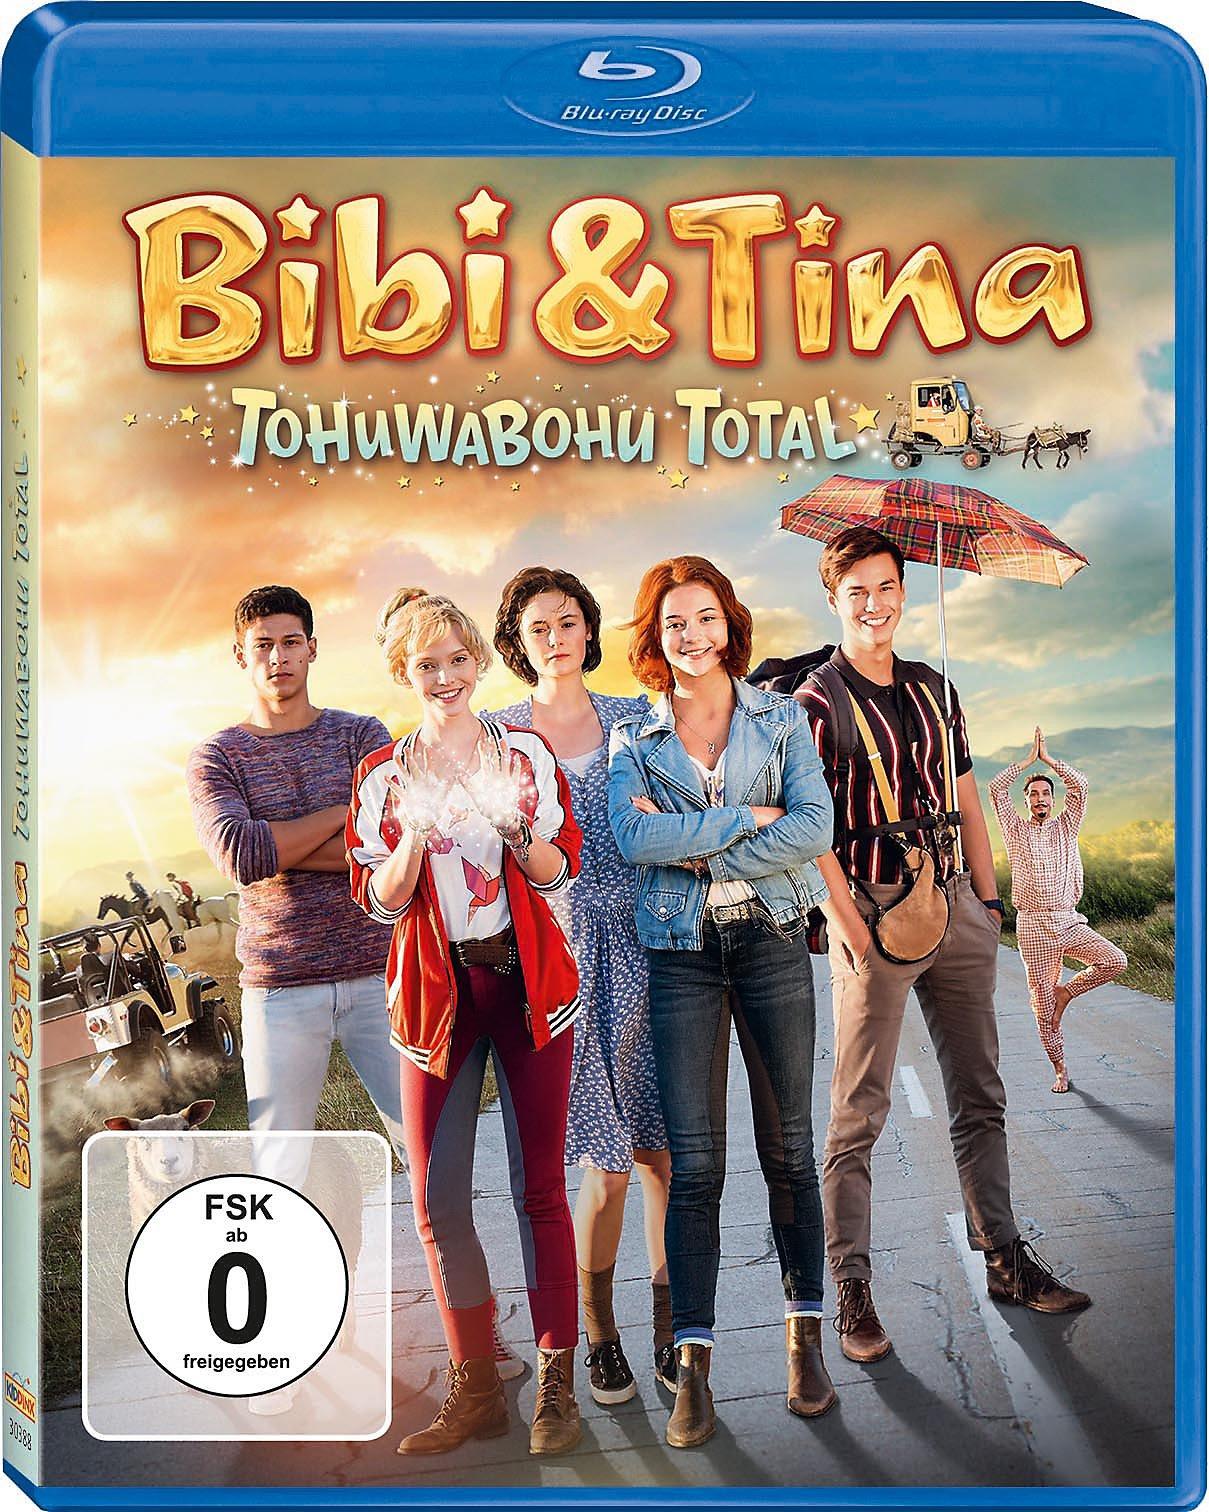 bibi und tina 4 tohuwabohu total bluray bei weltbildde